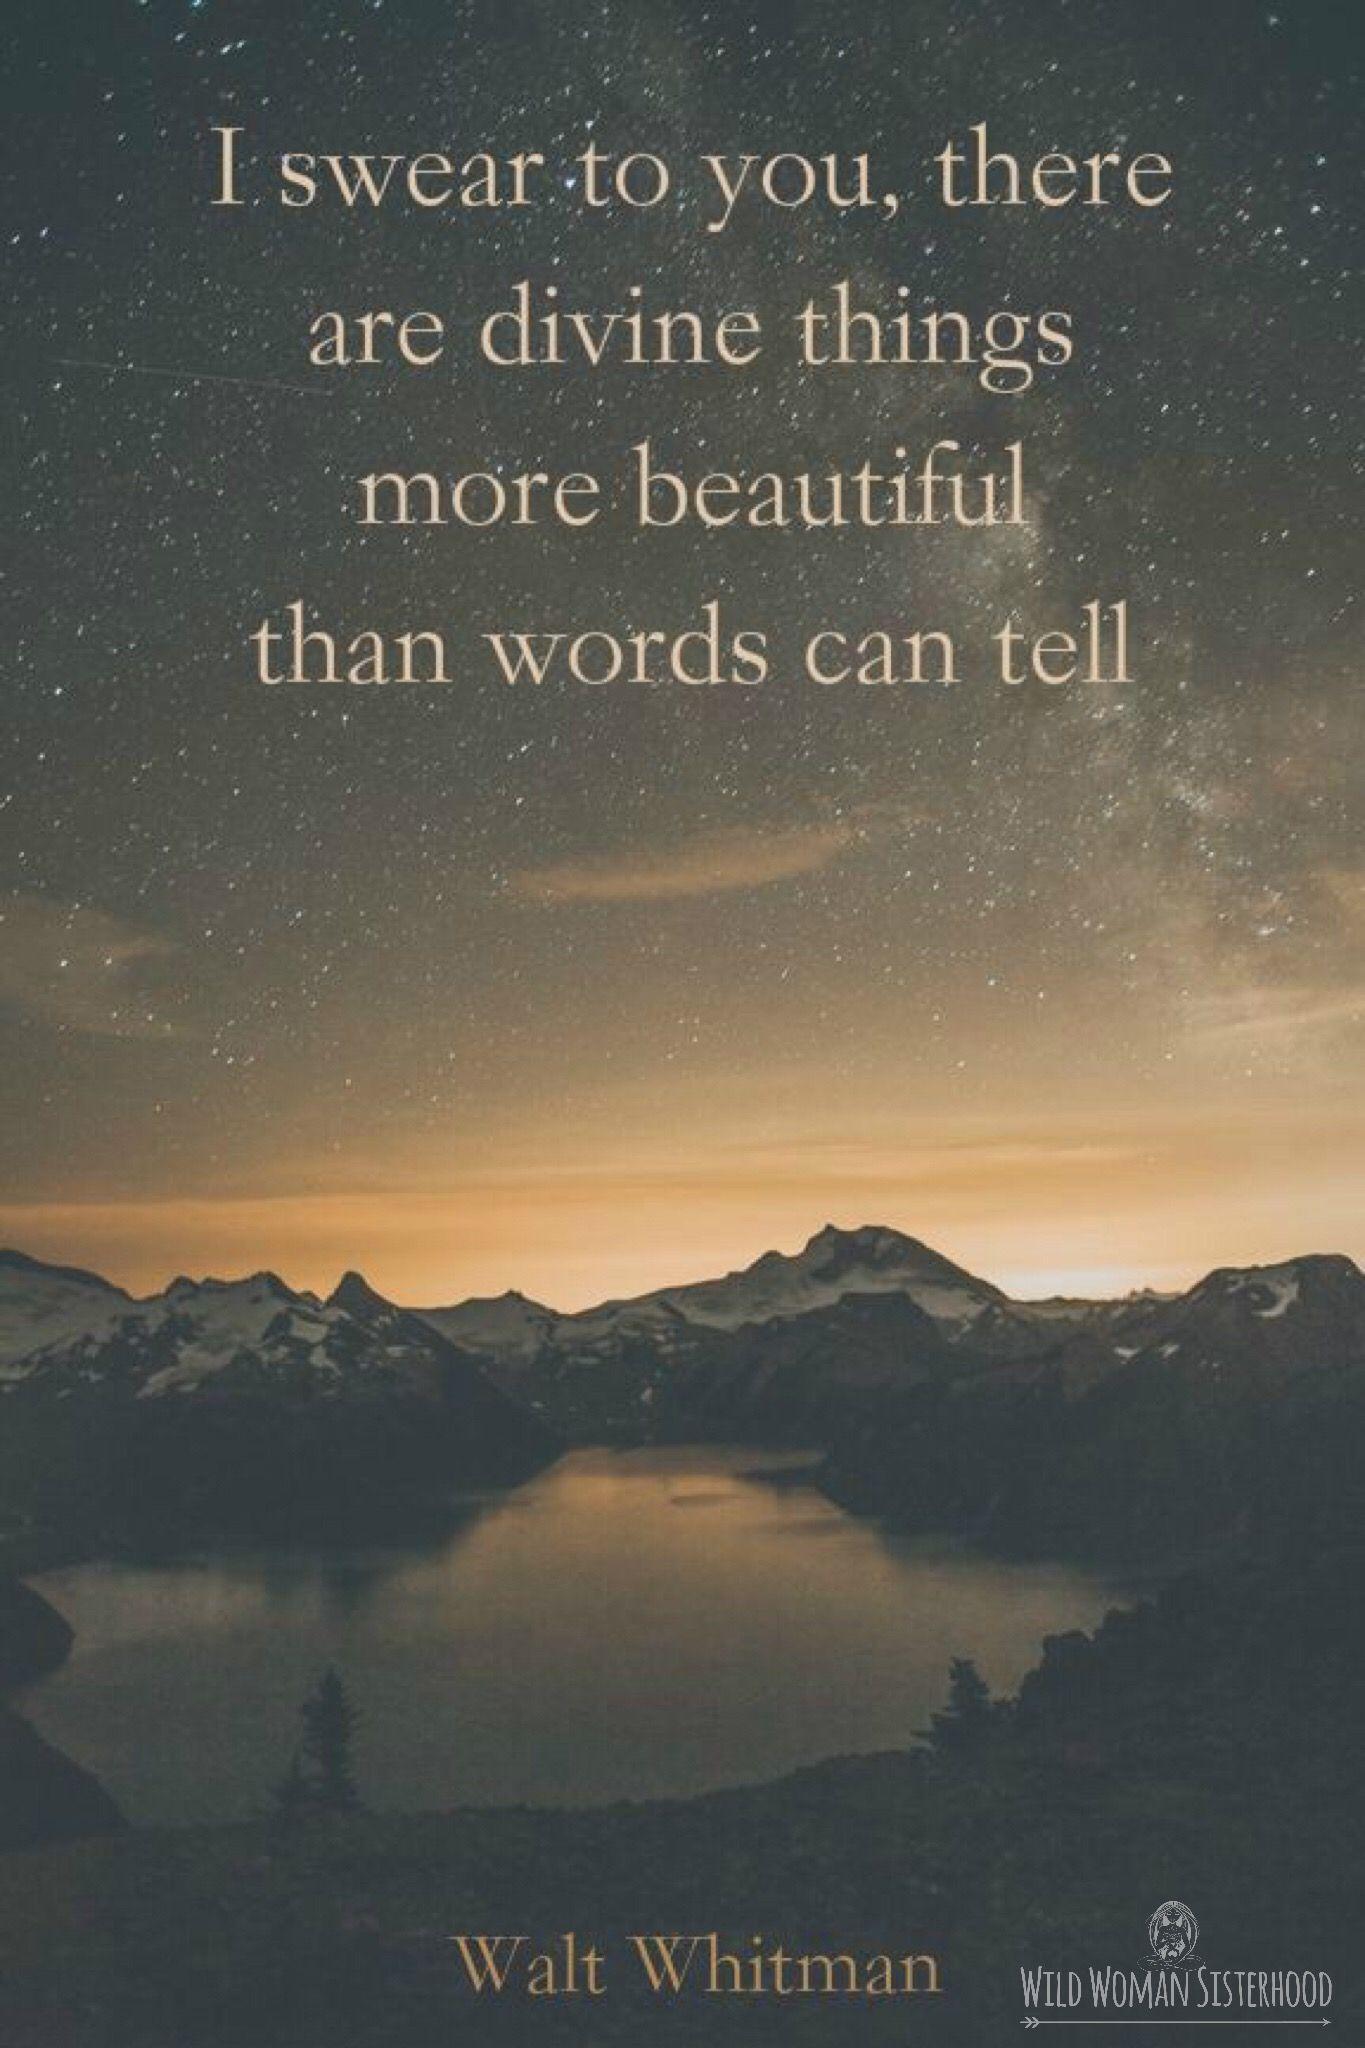 I swear to you there are Divine things more beautiful than words can tell..  ~ Walt Whitman WILD WOMAN SISTERHOODॐ #WildWomanSisterhood #theuniversewithin #wildwomanmedicine #brewyourmedicine